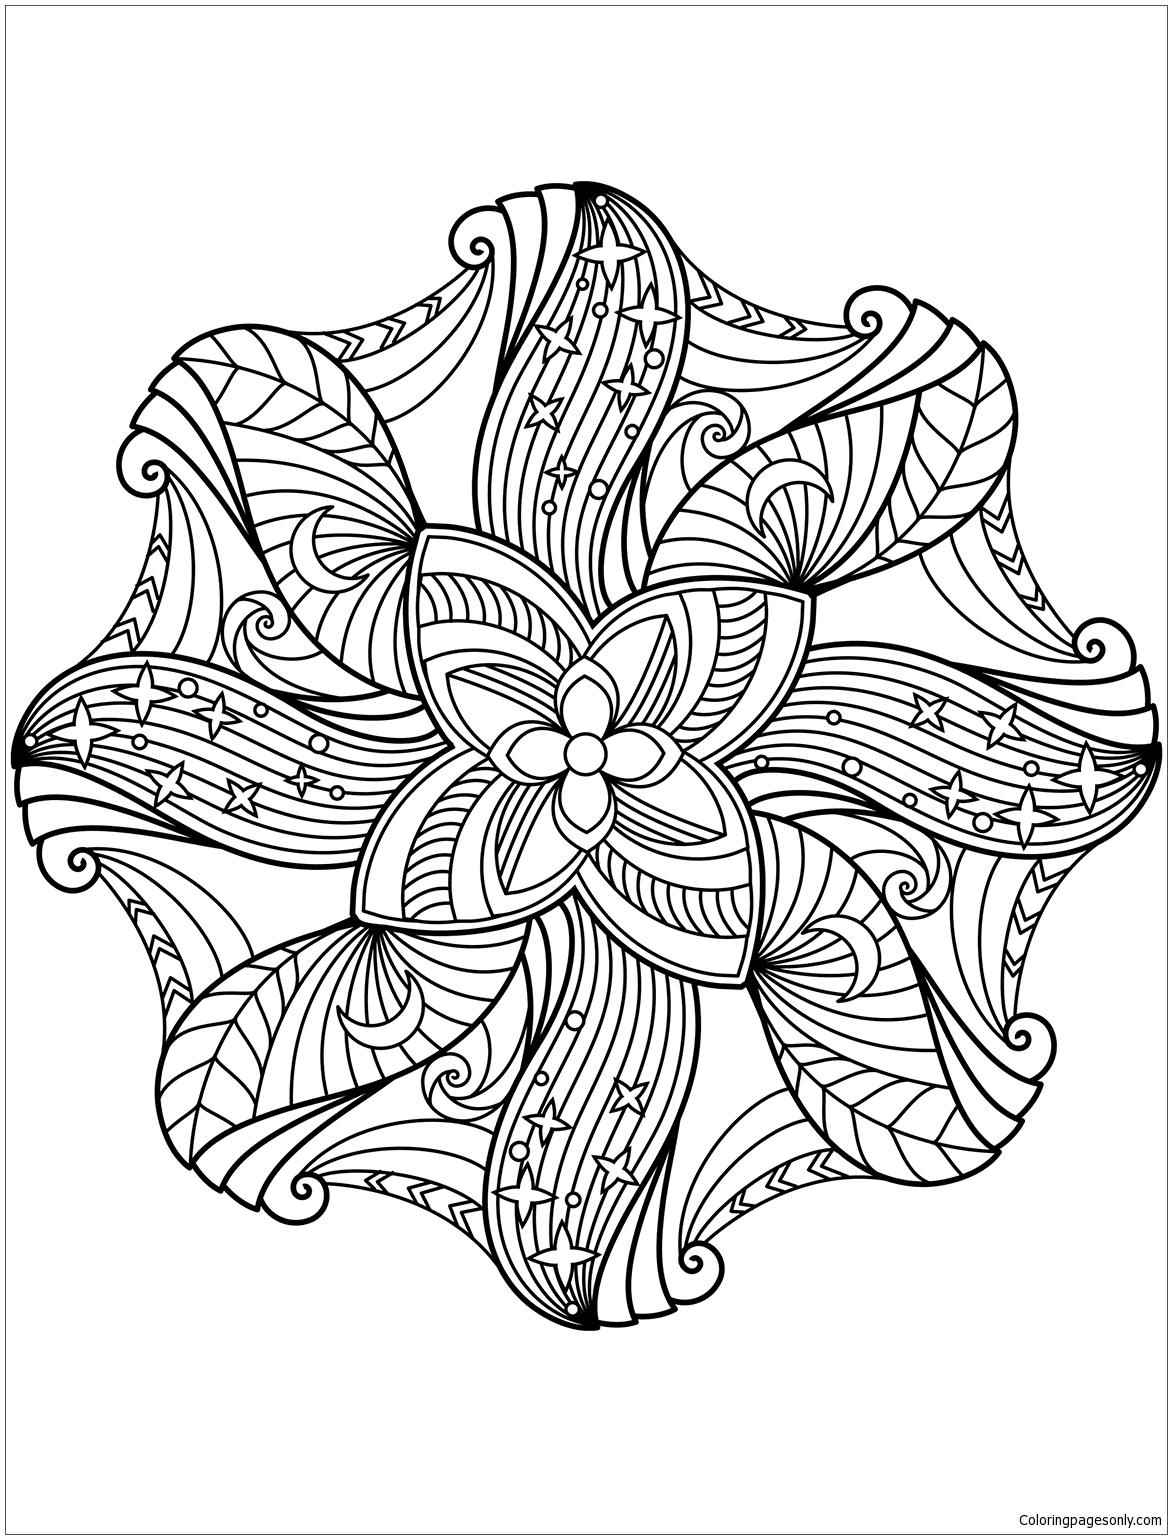 Floral Mandalas Coloring Page